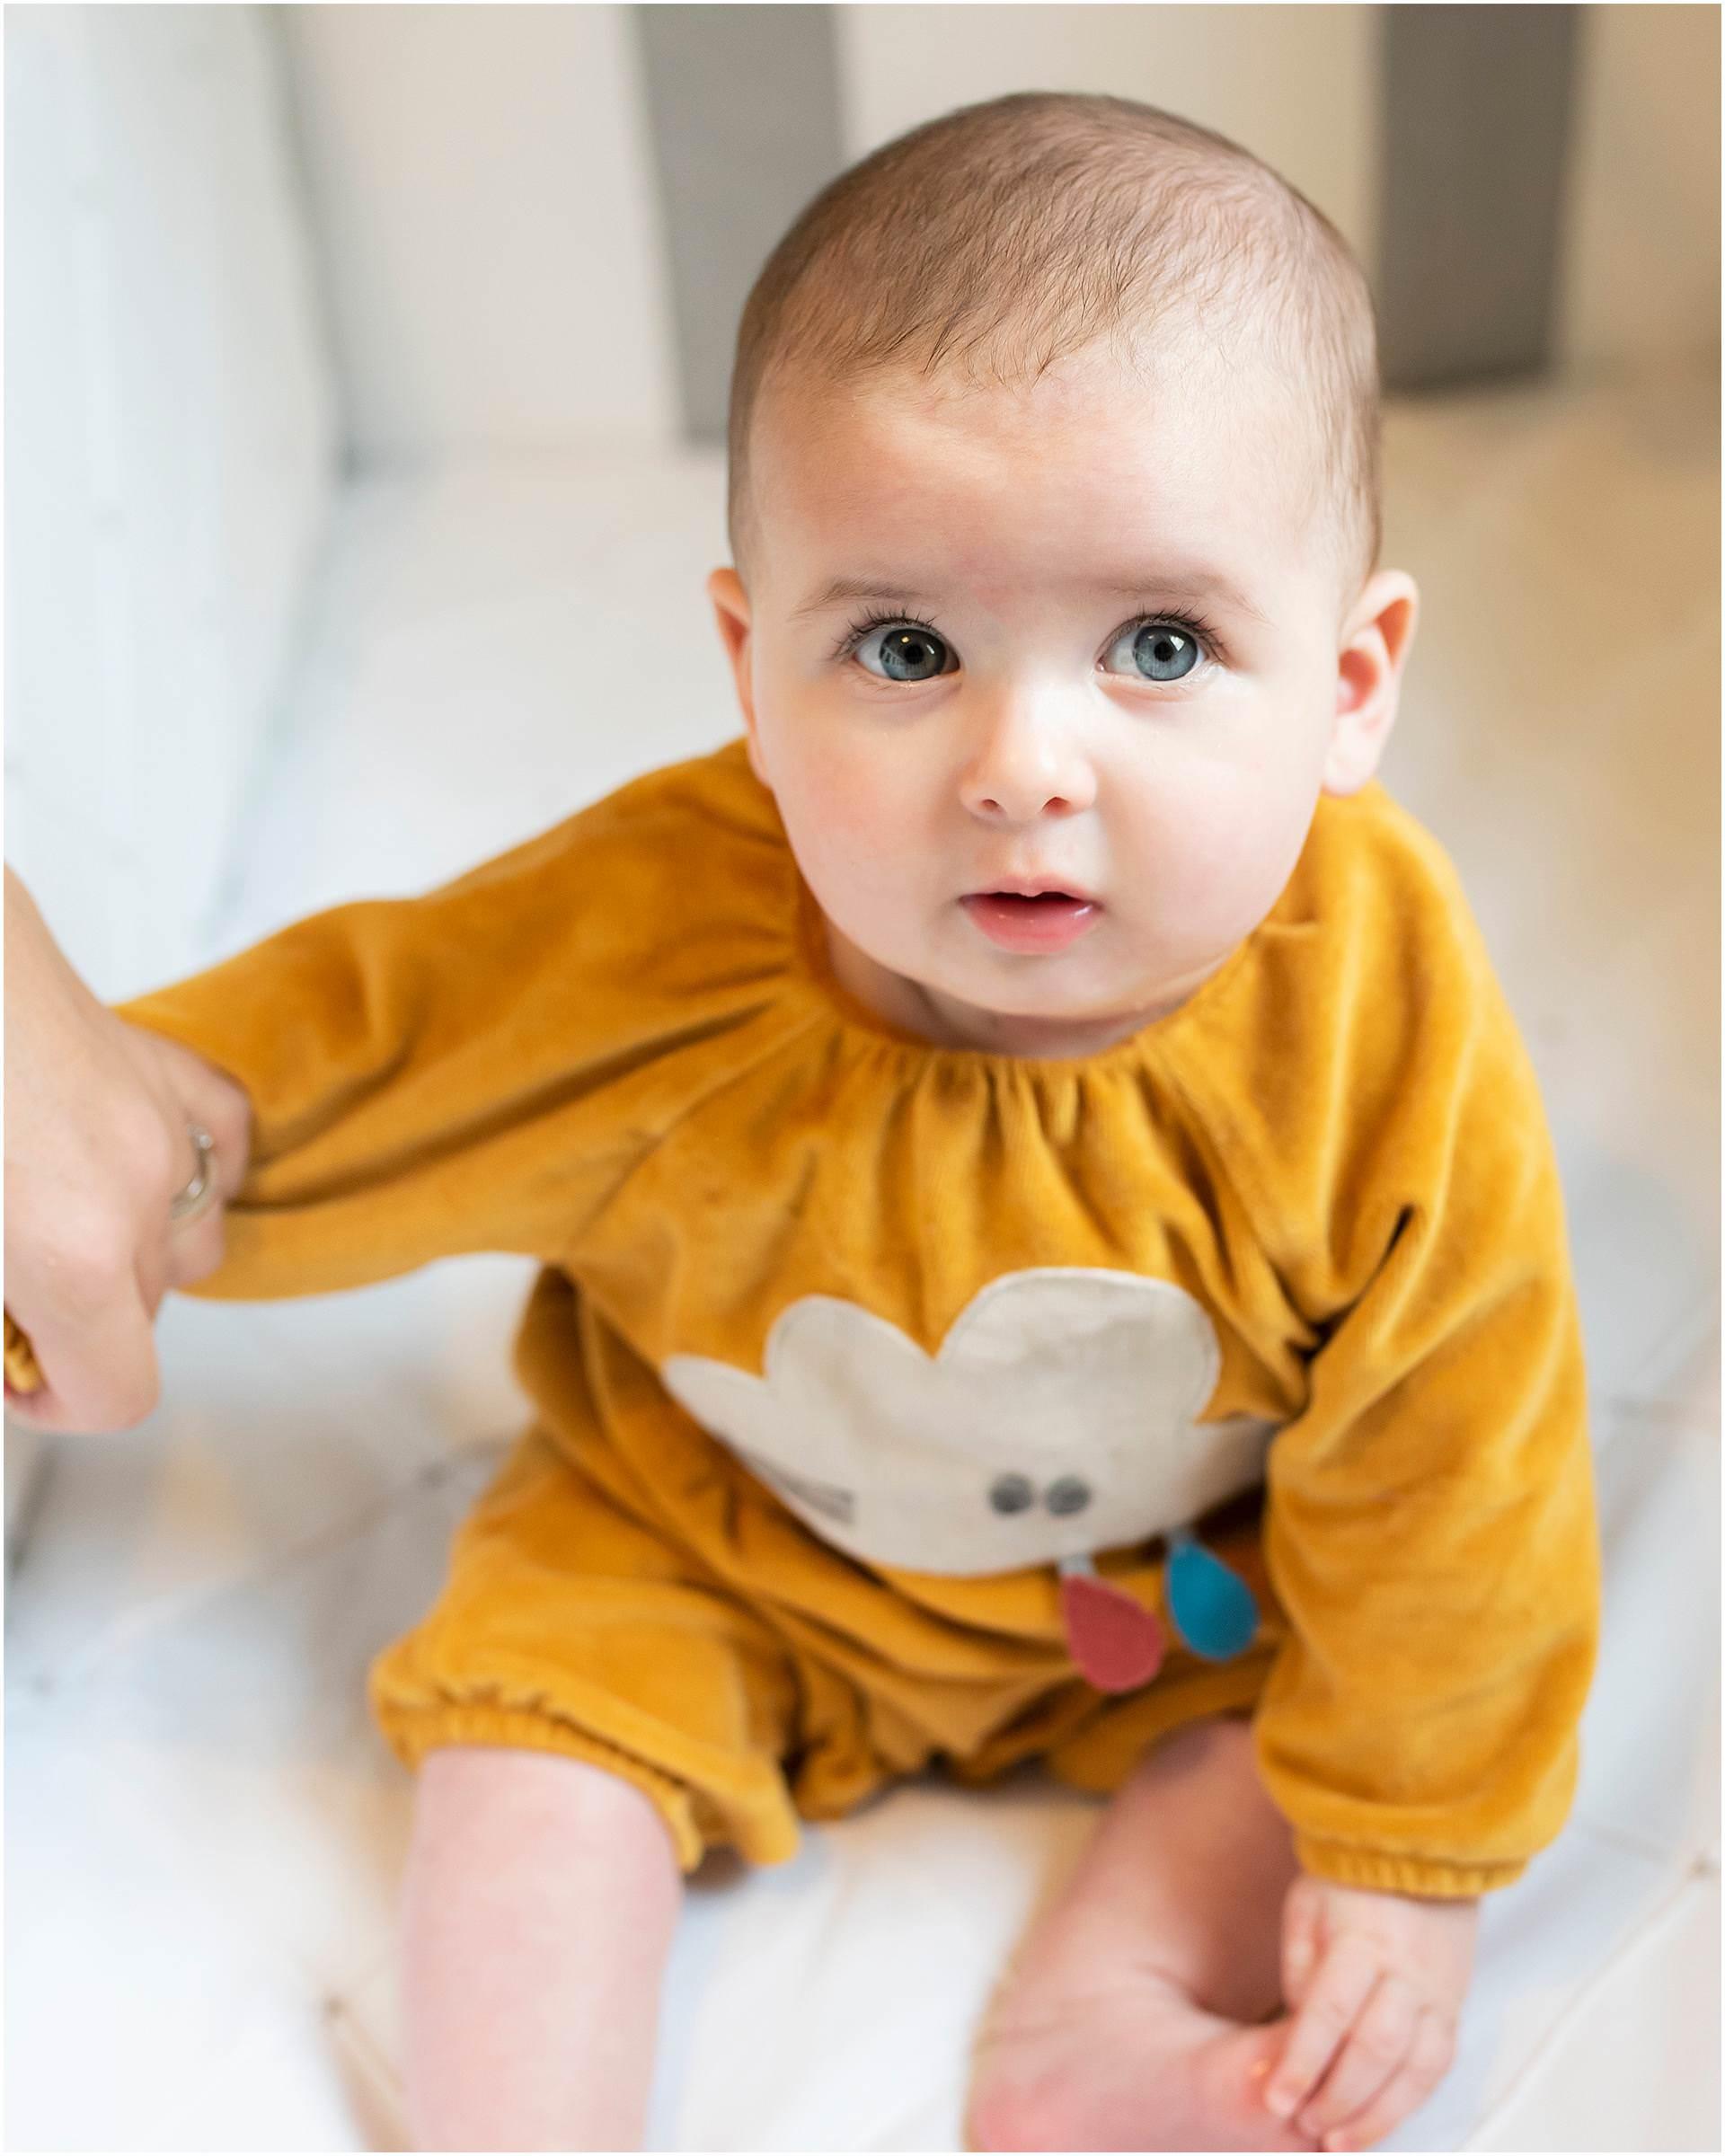 Newborn_photography with Sarah_bee_photography lifestyle_photography family_photography natural_photography photography_in_your_own_home baby_and_child_photography_1953.jpg